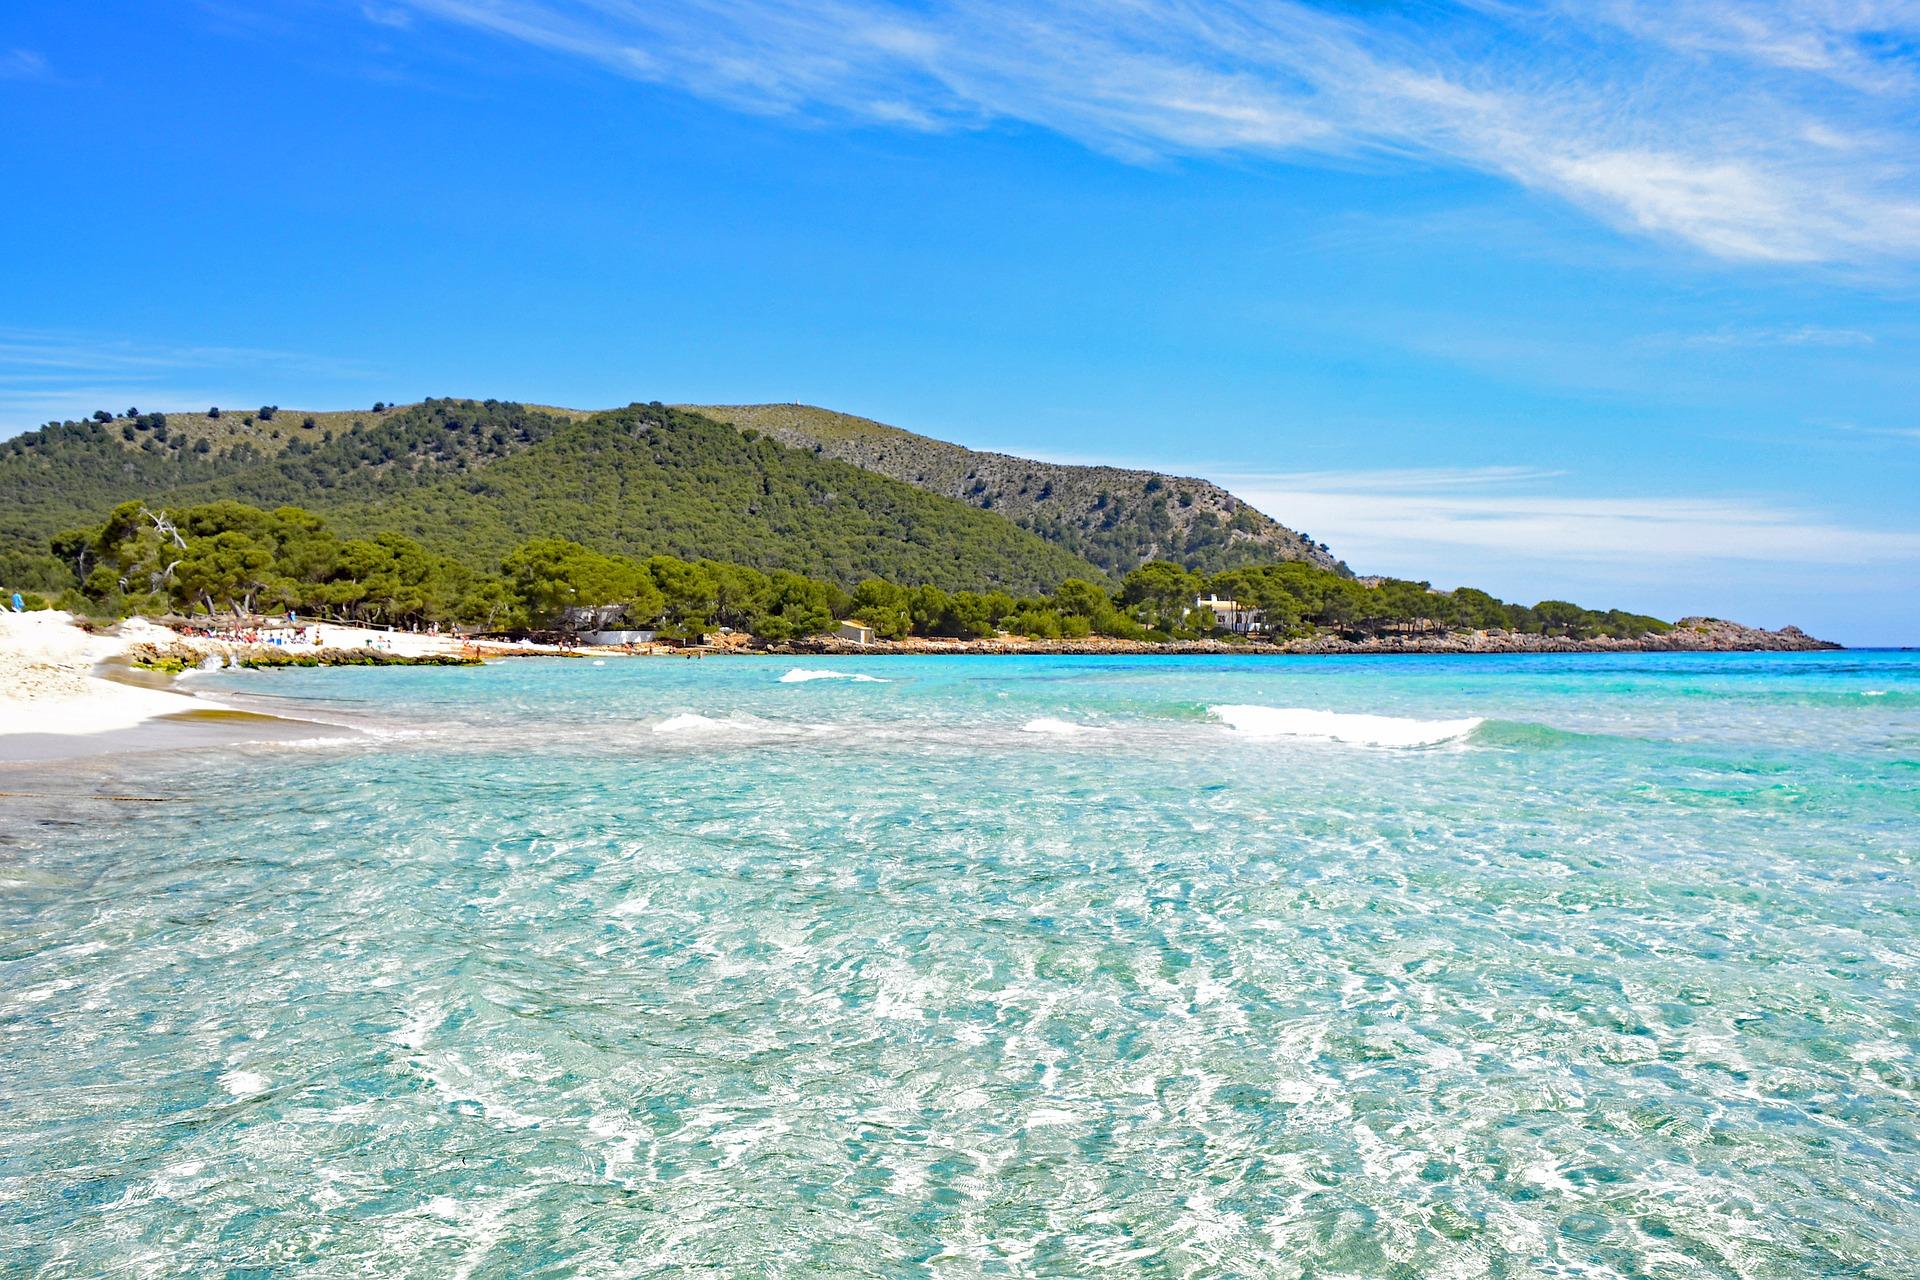 playas baratas espana 2017